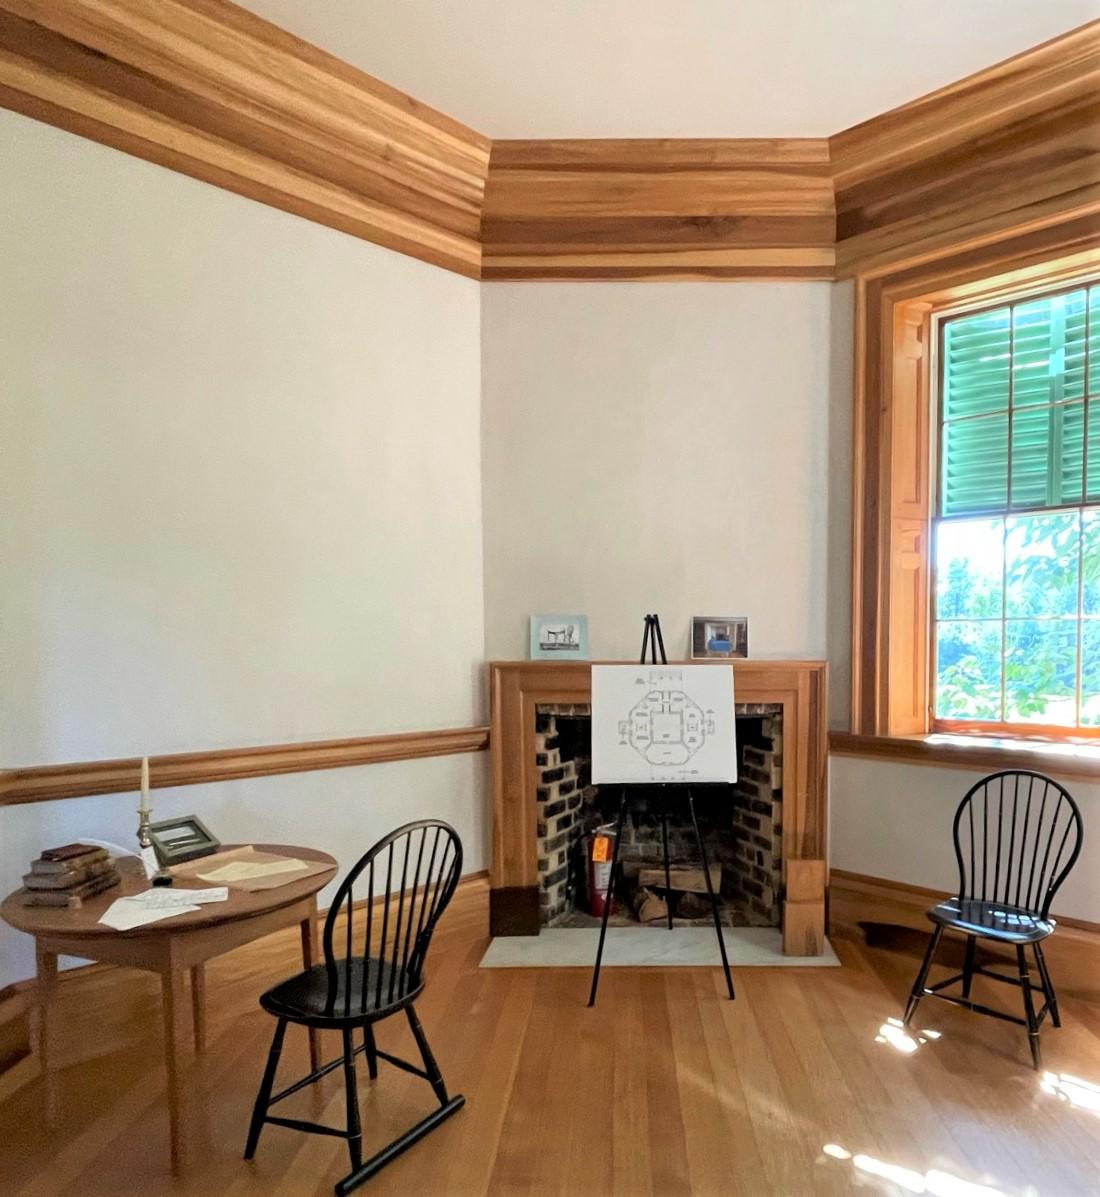 Thomas Jefferson's bedroom at Poplar Forest